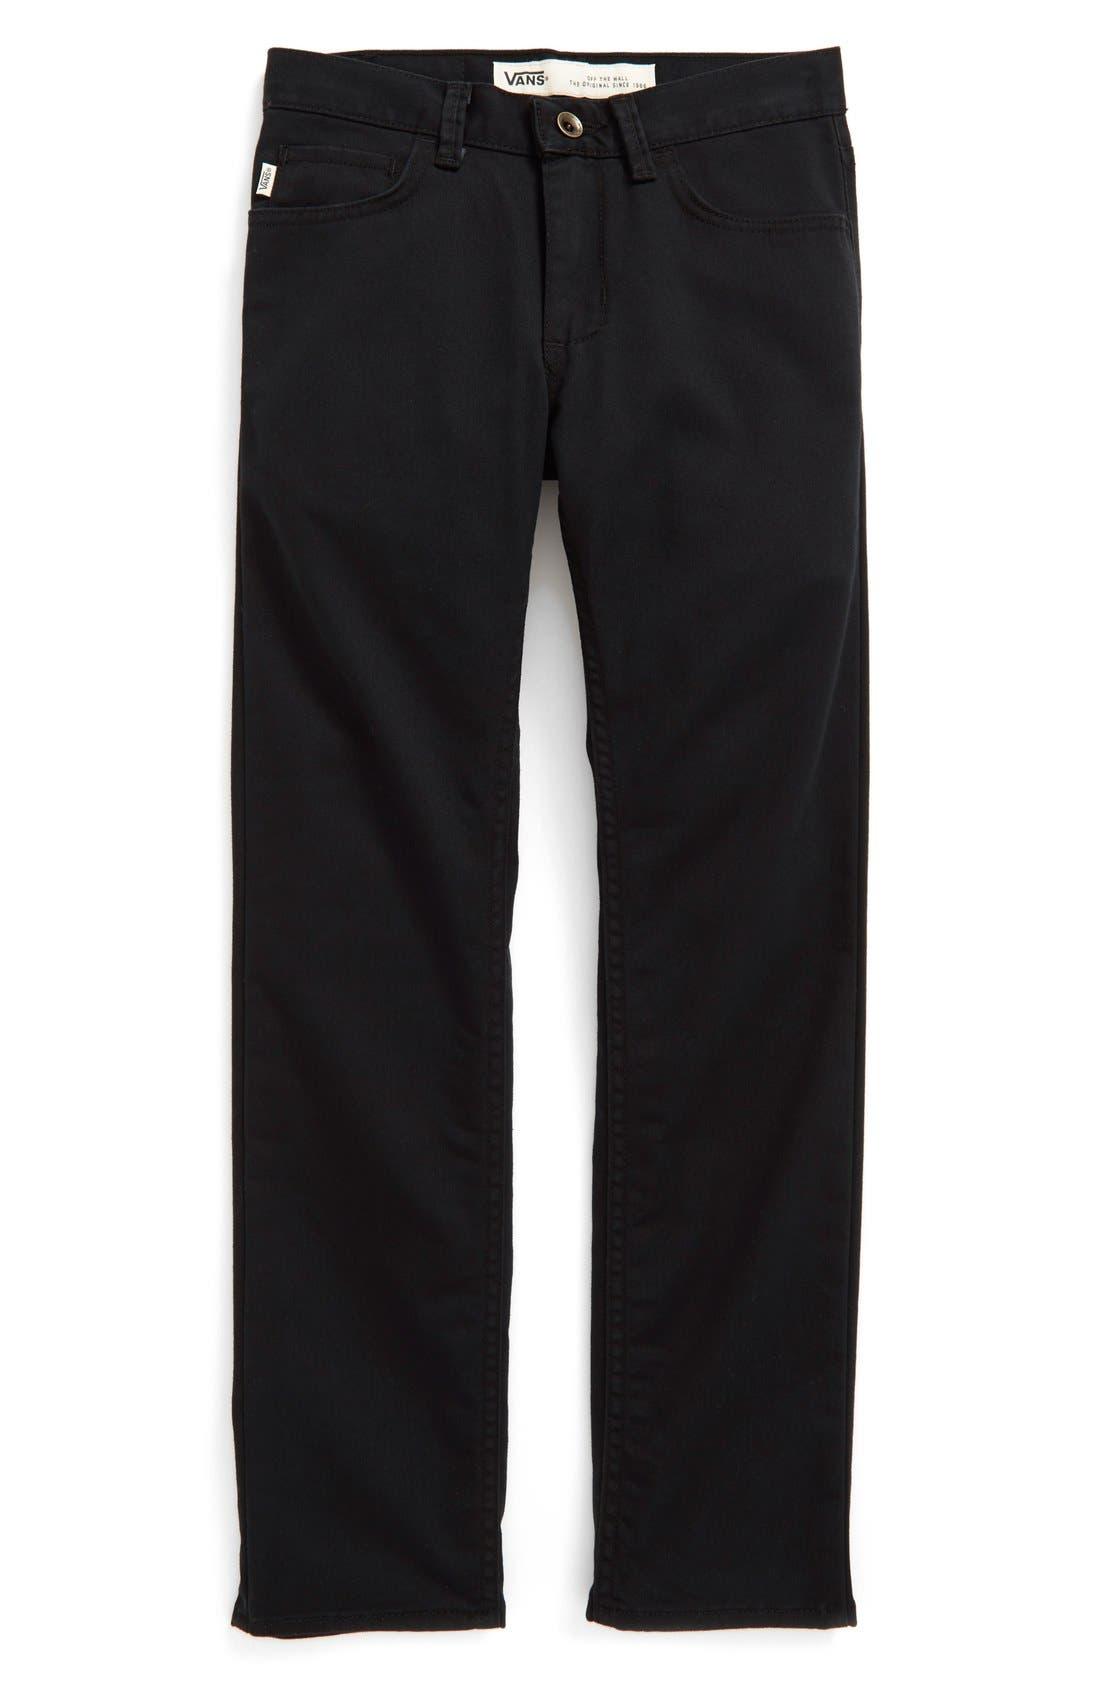 'V56 Standard AV Covina' Pants,                         Main,                         color, Black